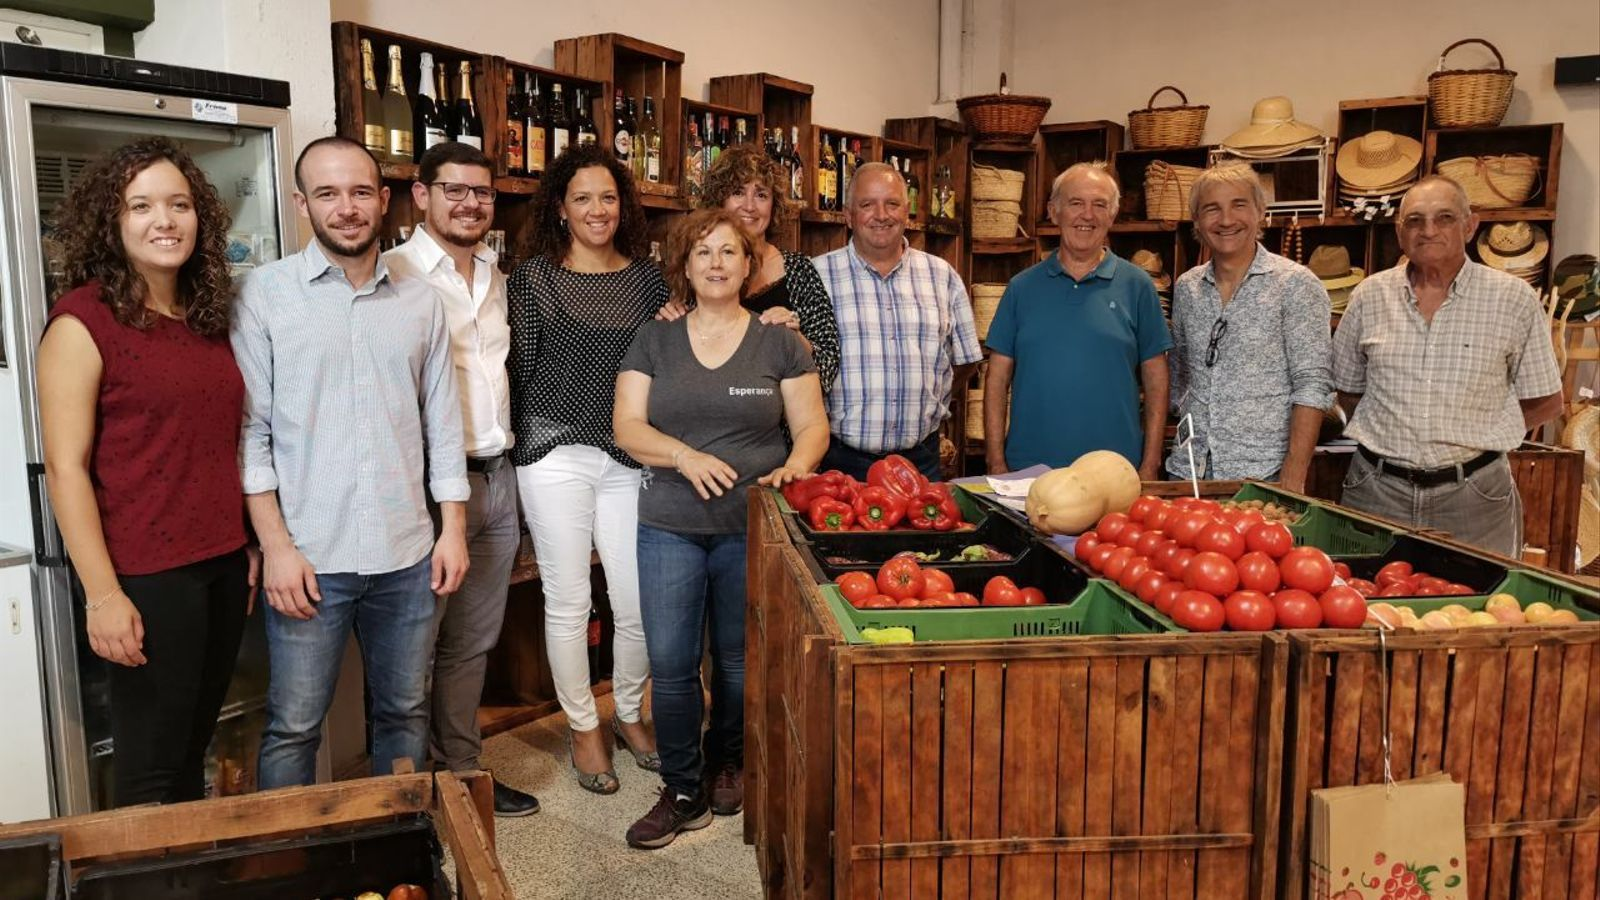 Visita institucional a la Cooperativa Agrícola de Porreres